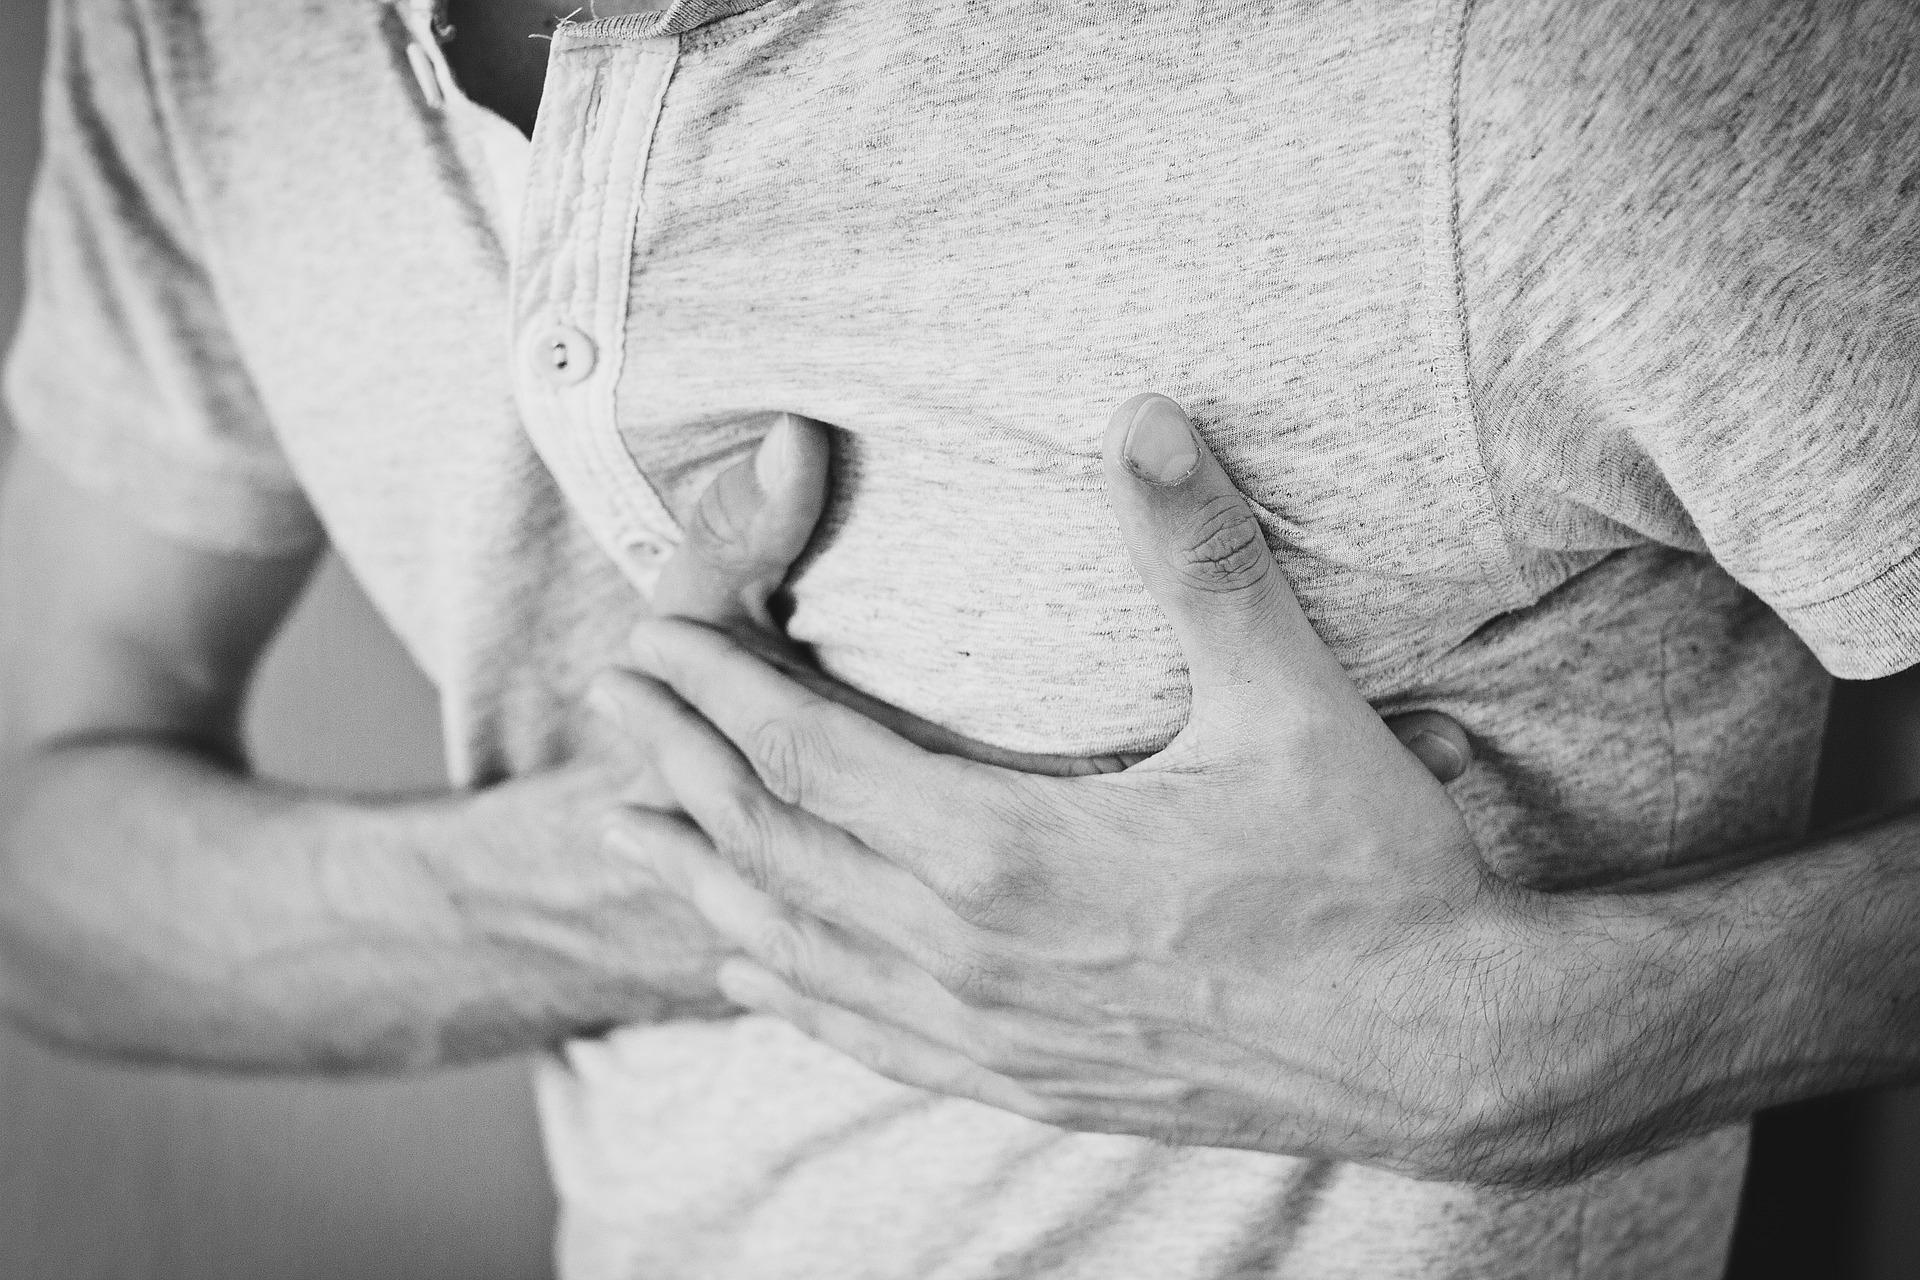 Gérer son cholestérol